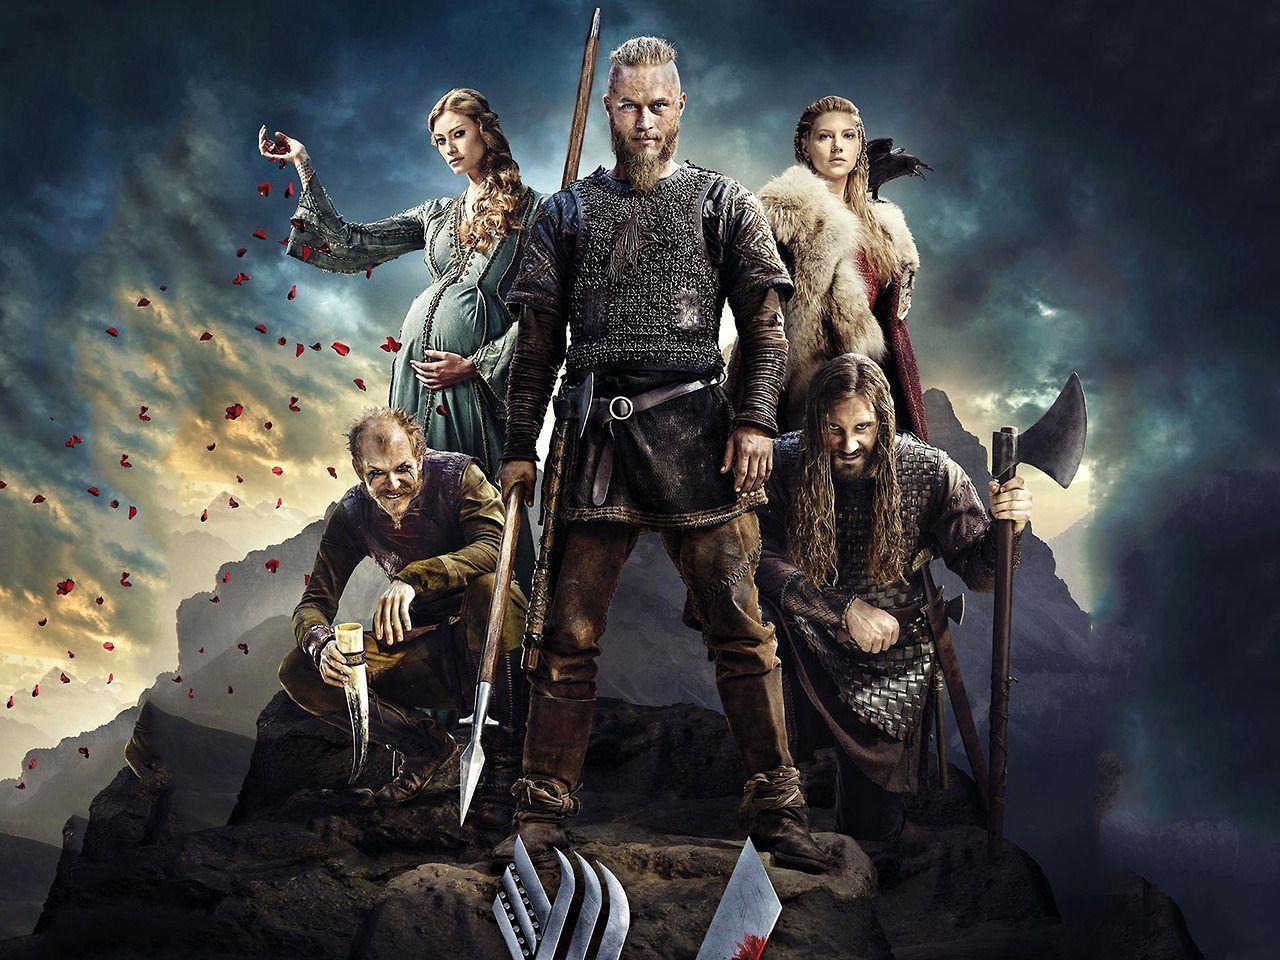 ваш роман картинки нд качества викинги происходит даже